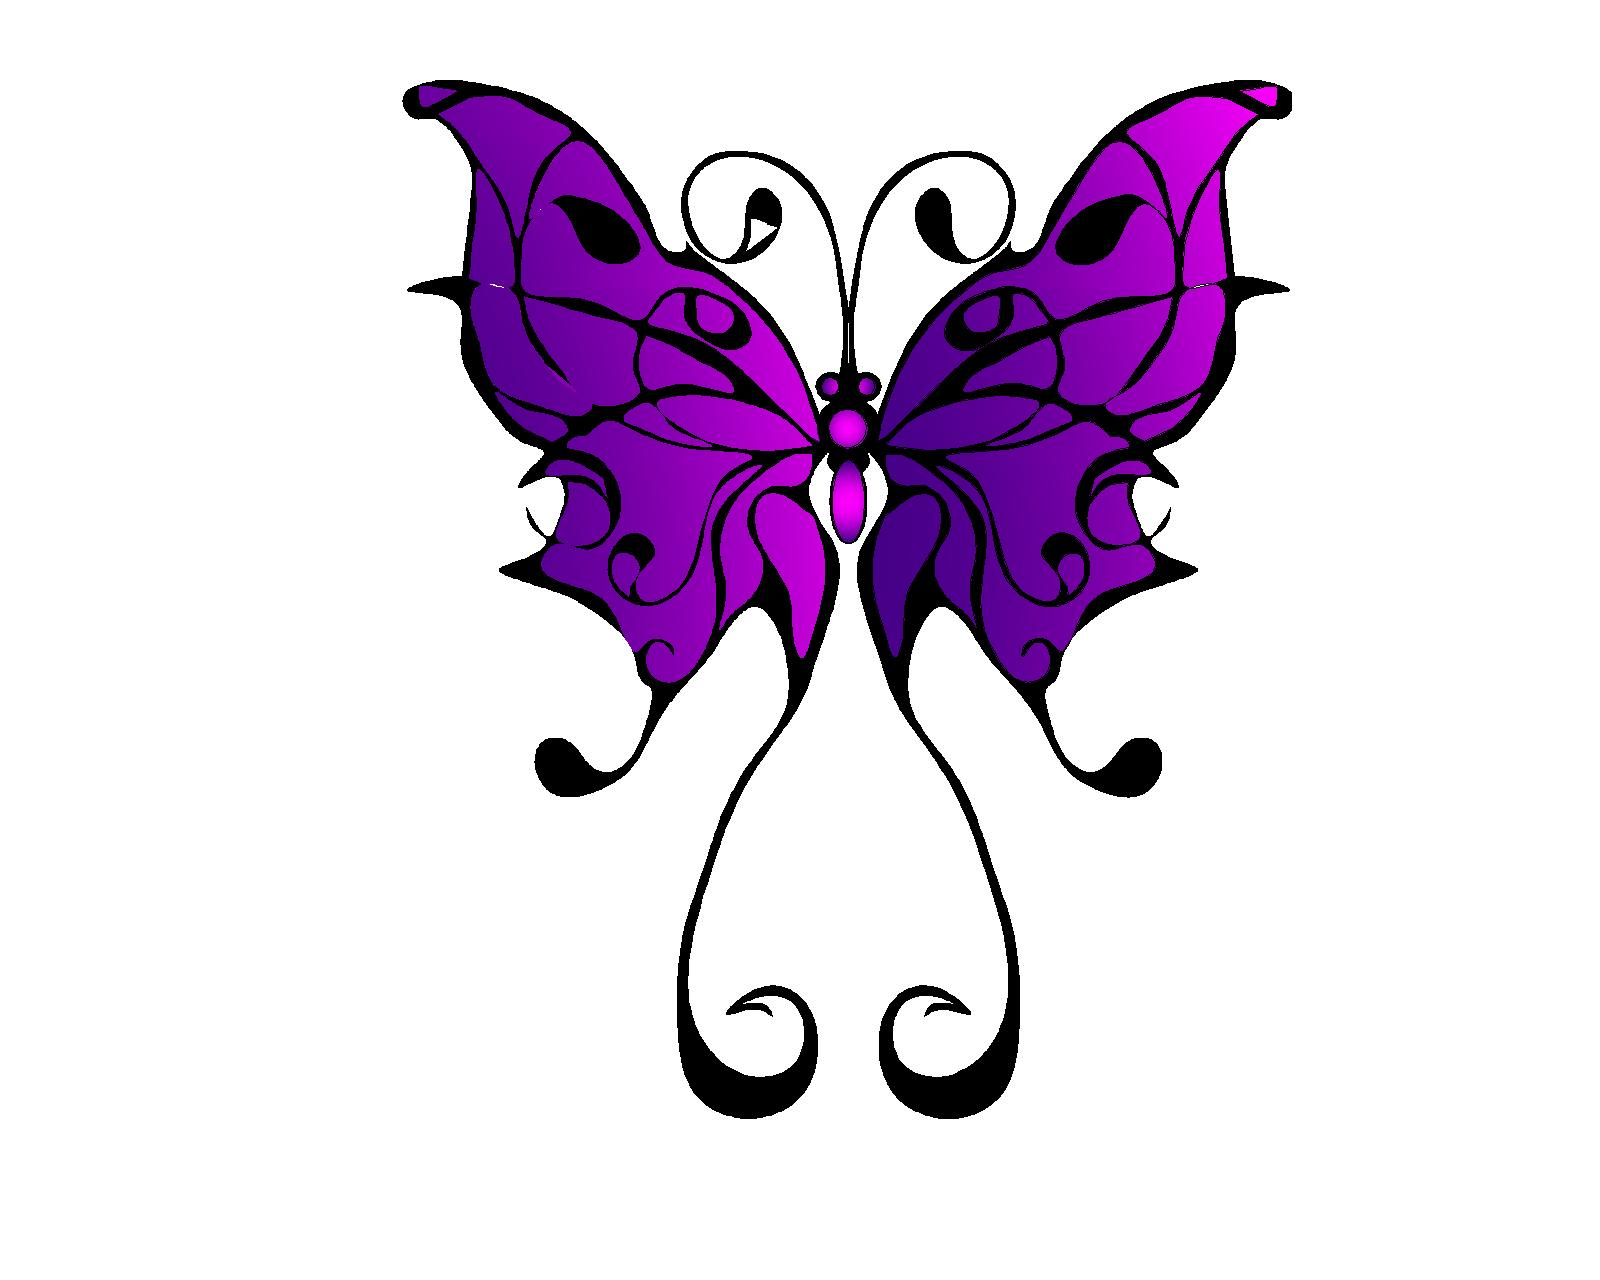 Butterfly Flower Tattoo Designs Free